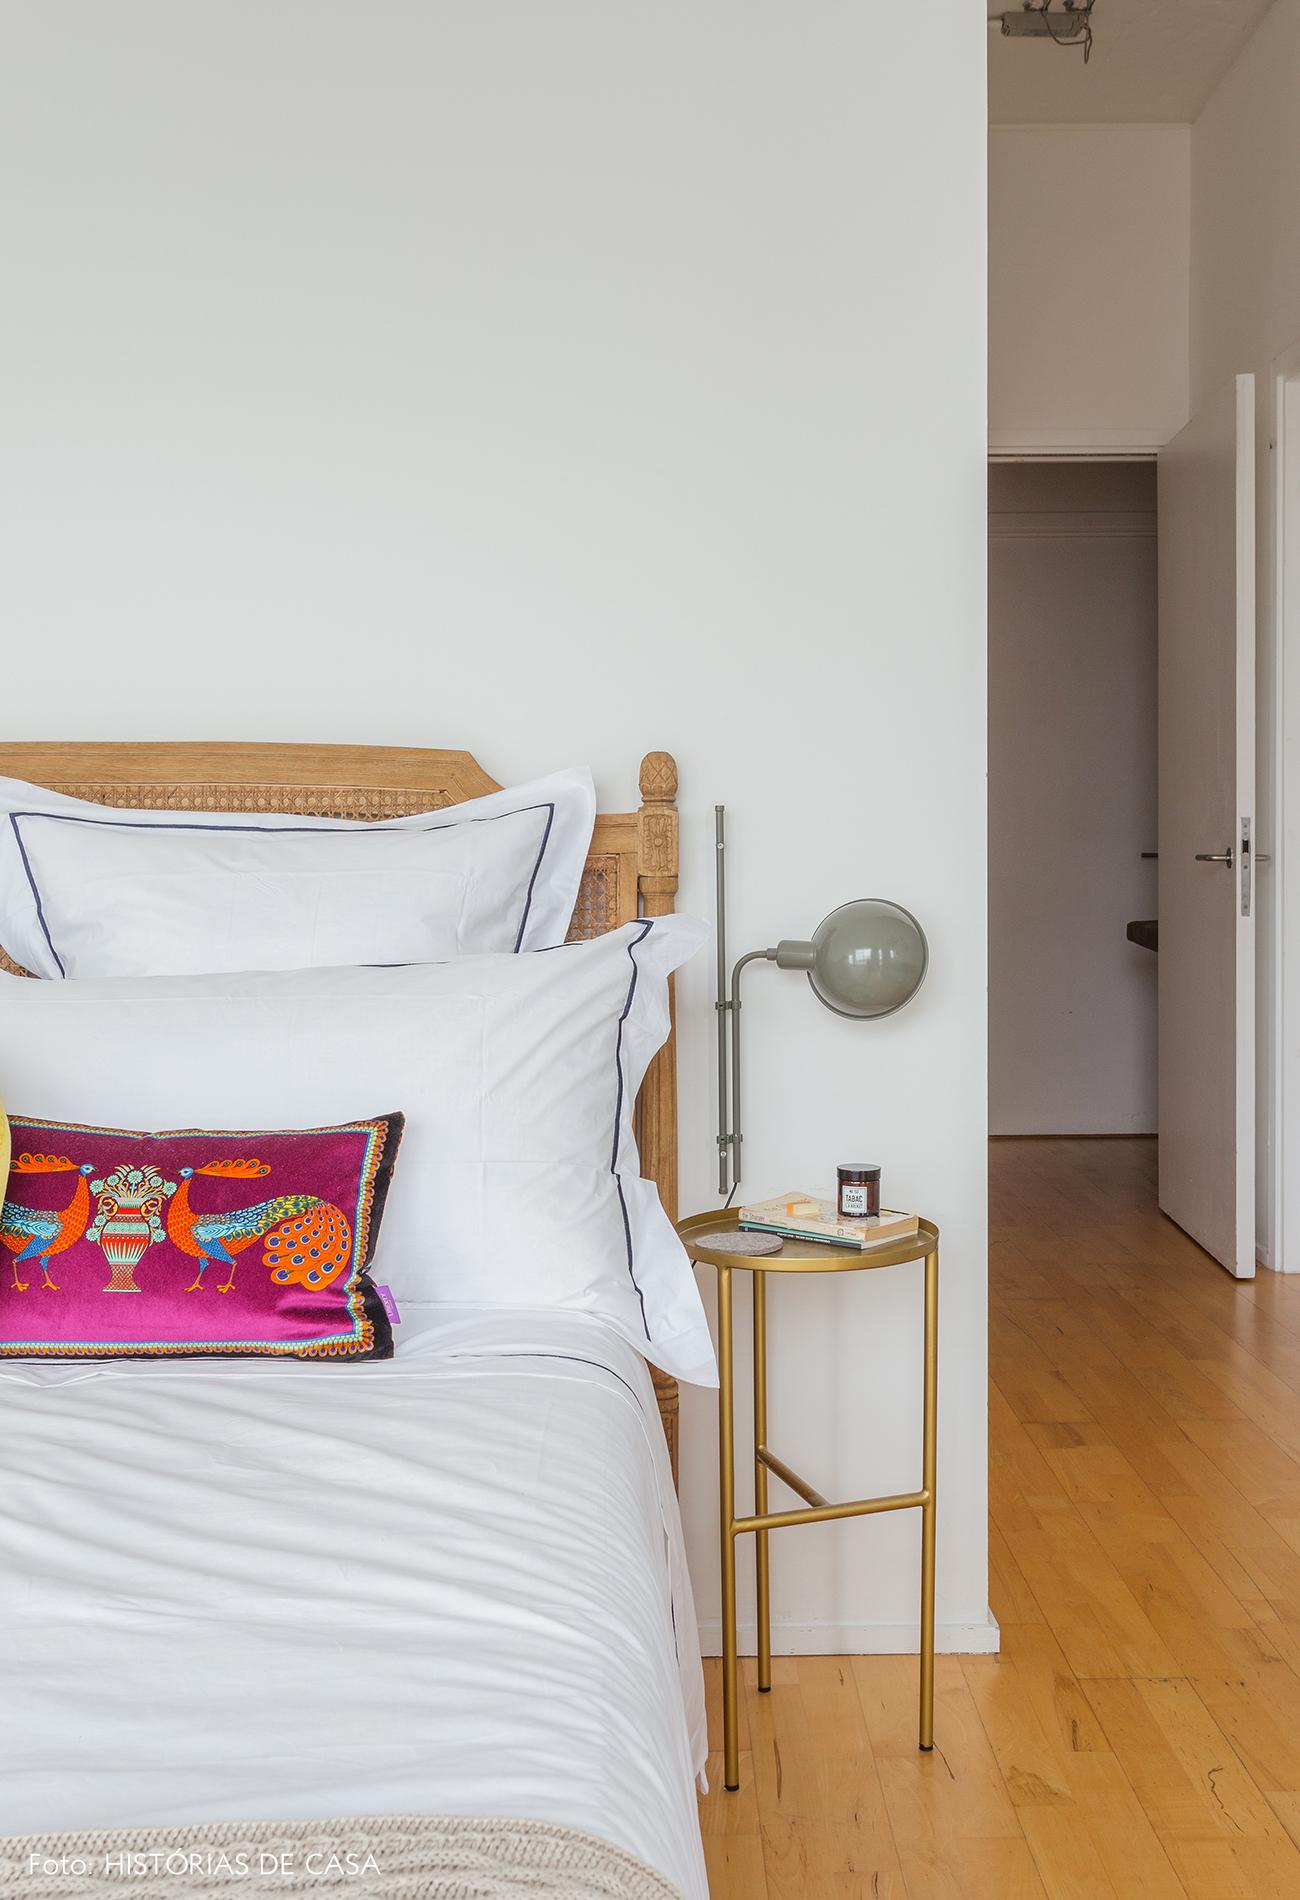 Bedroom with vintage sconces and modern furniture